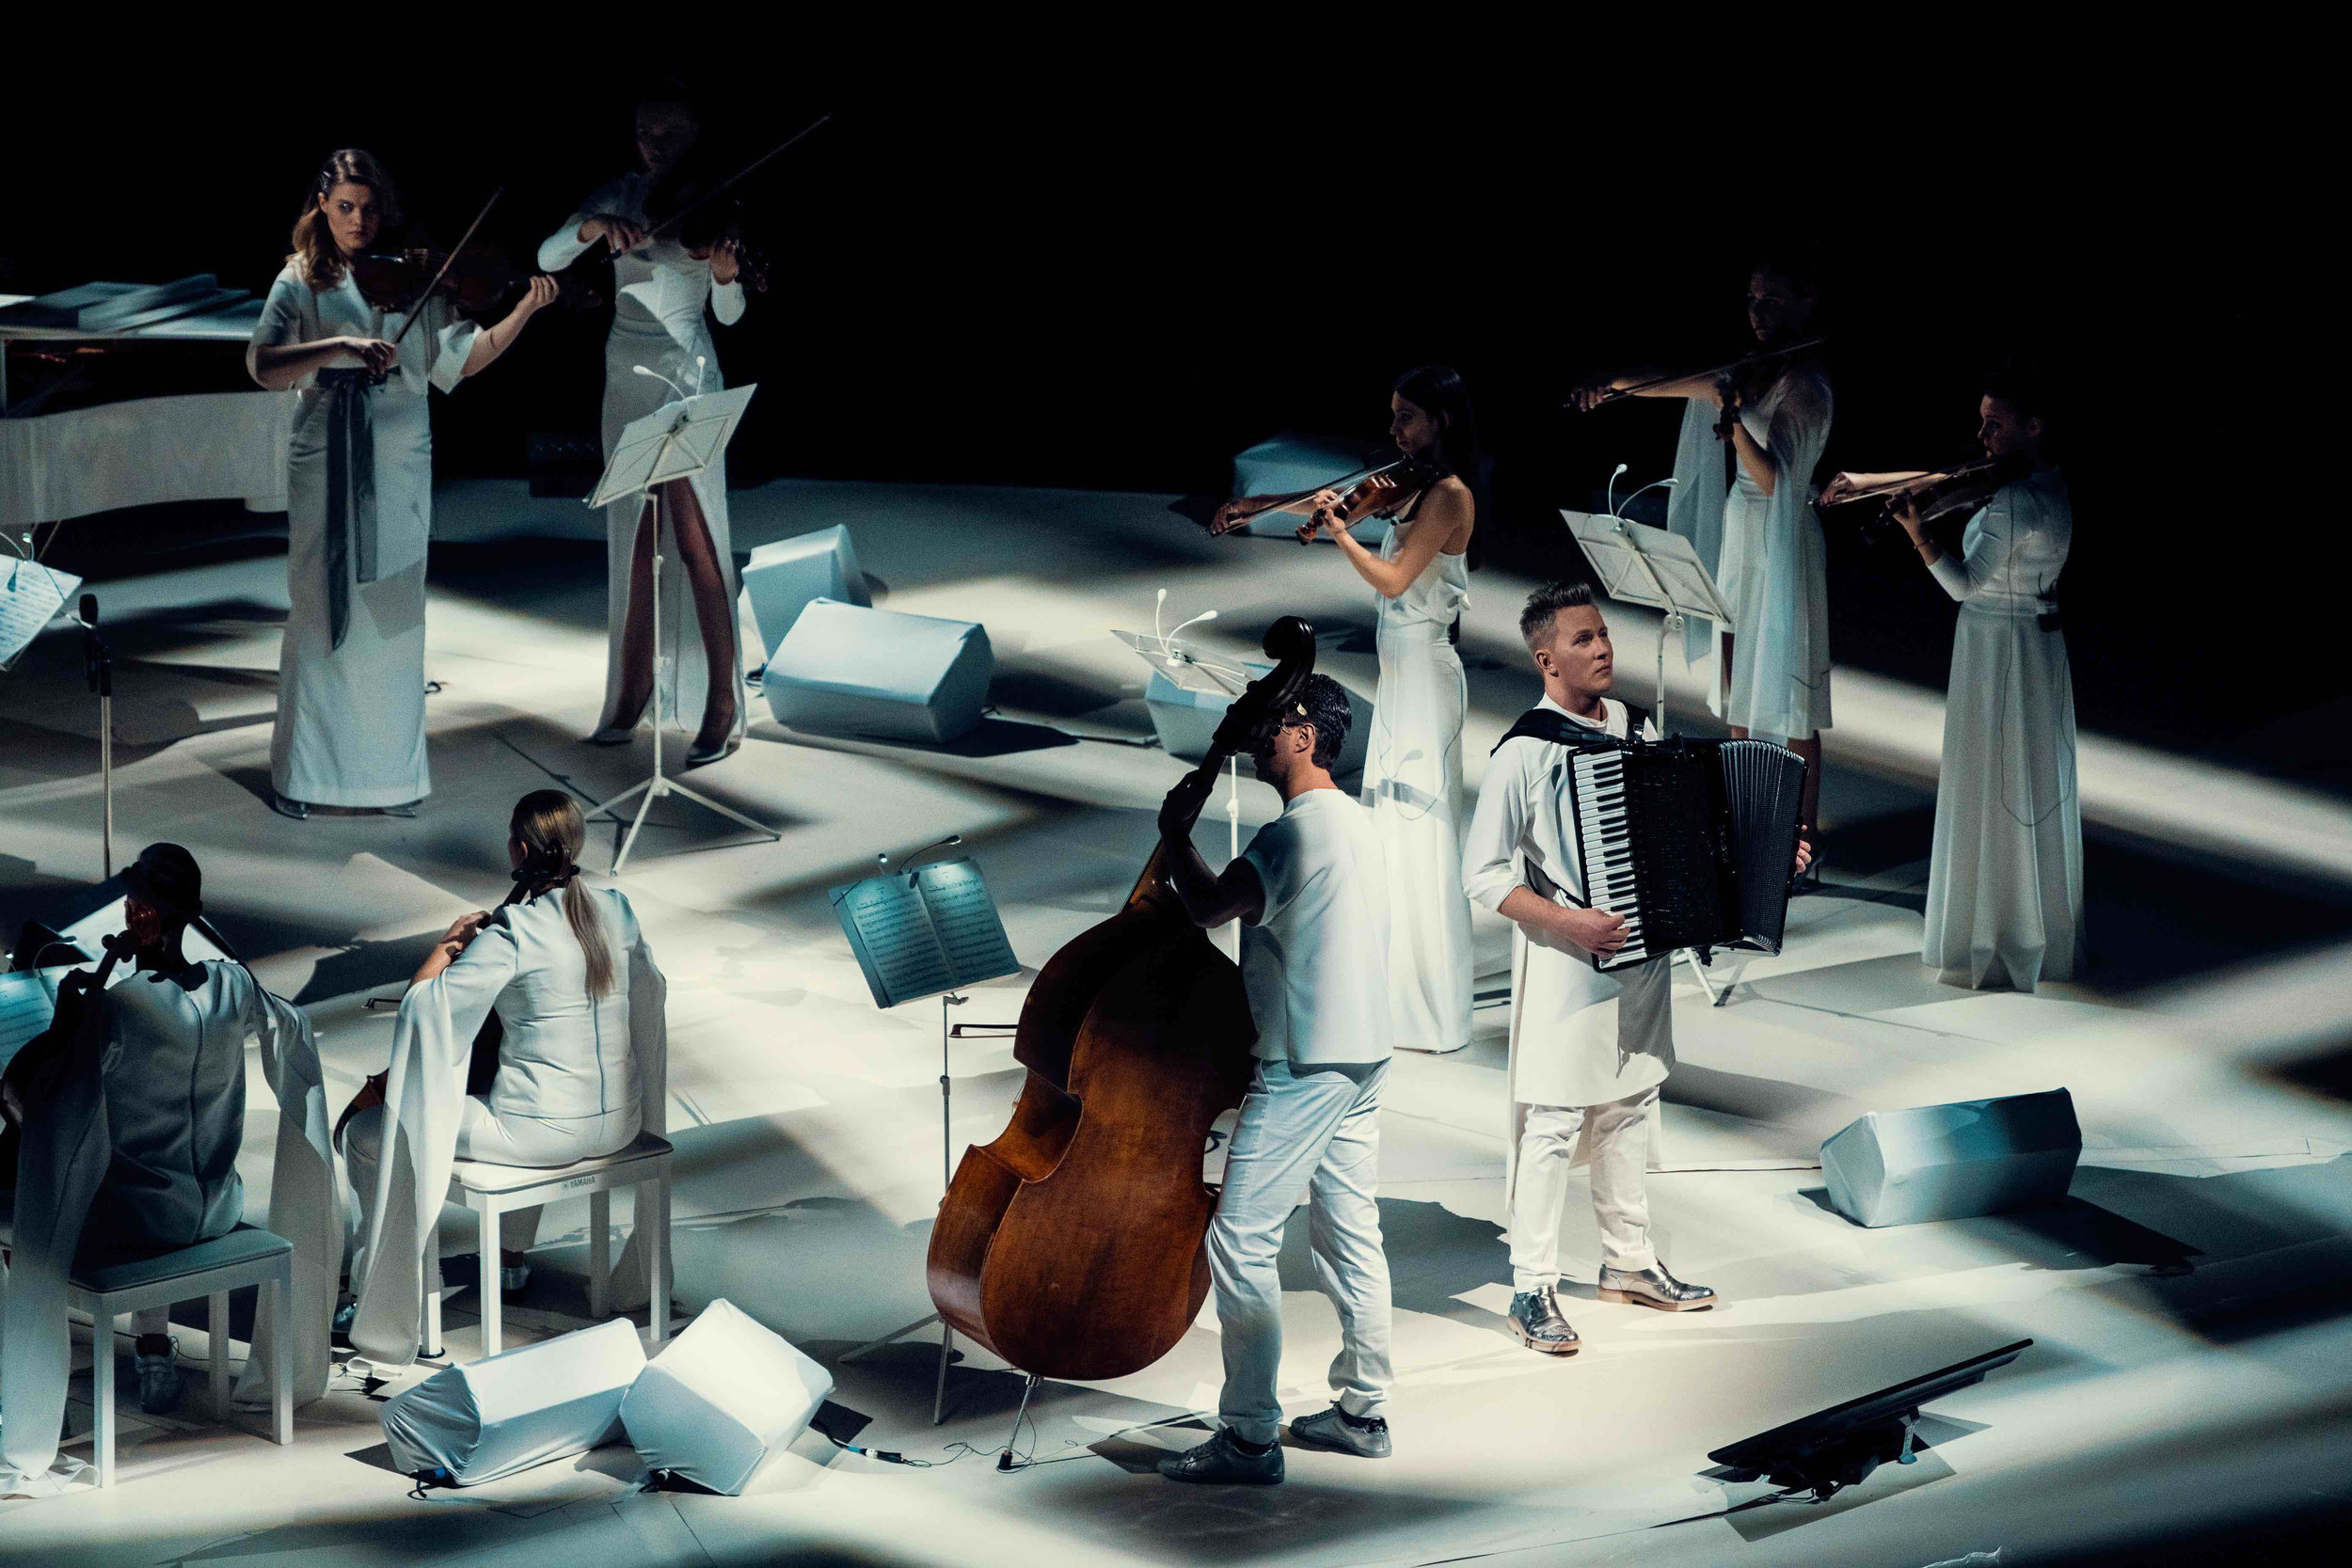 Martynas Levickis and Vilnius City Ensemble Mikroorkestra_3.jpg